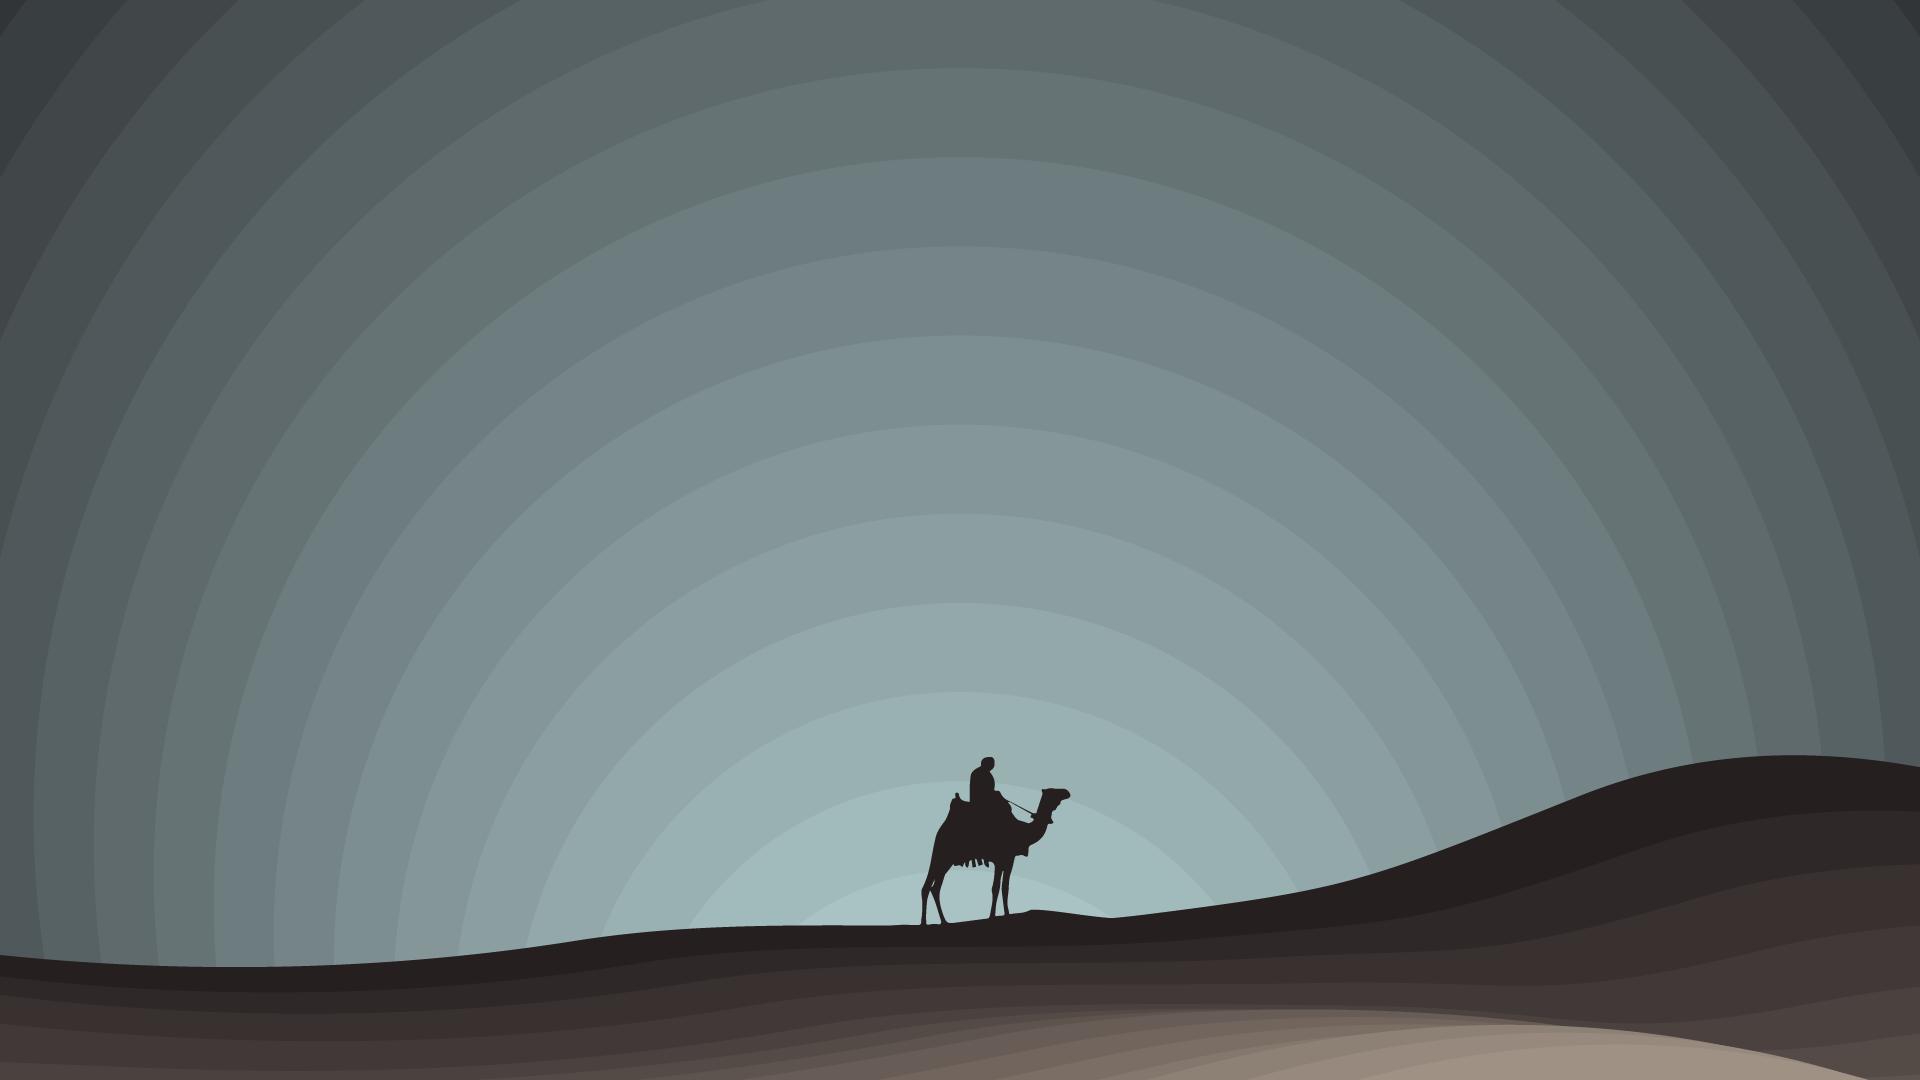 Desktop Wallpaper Minimalist Desert Night